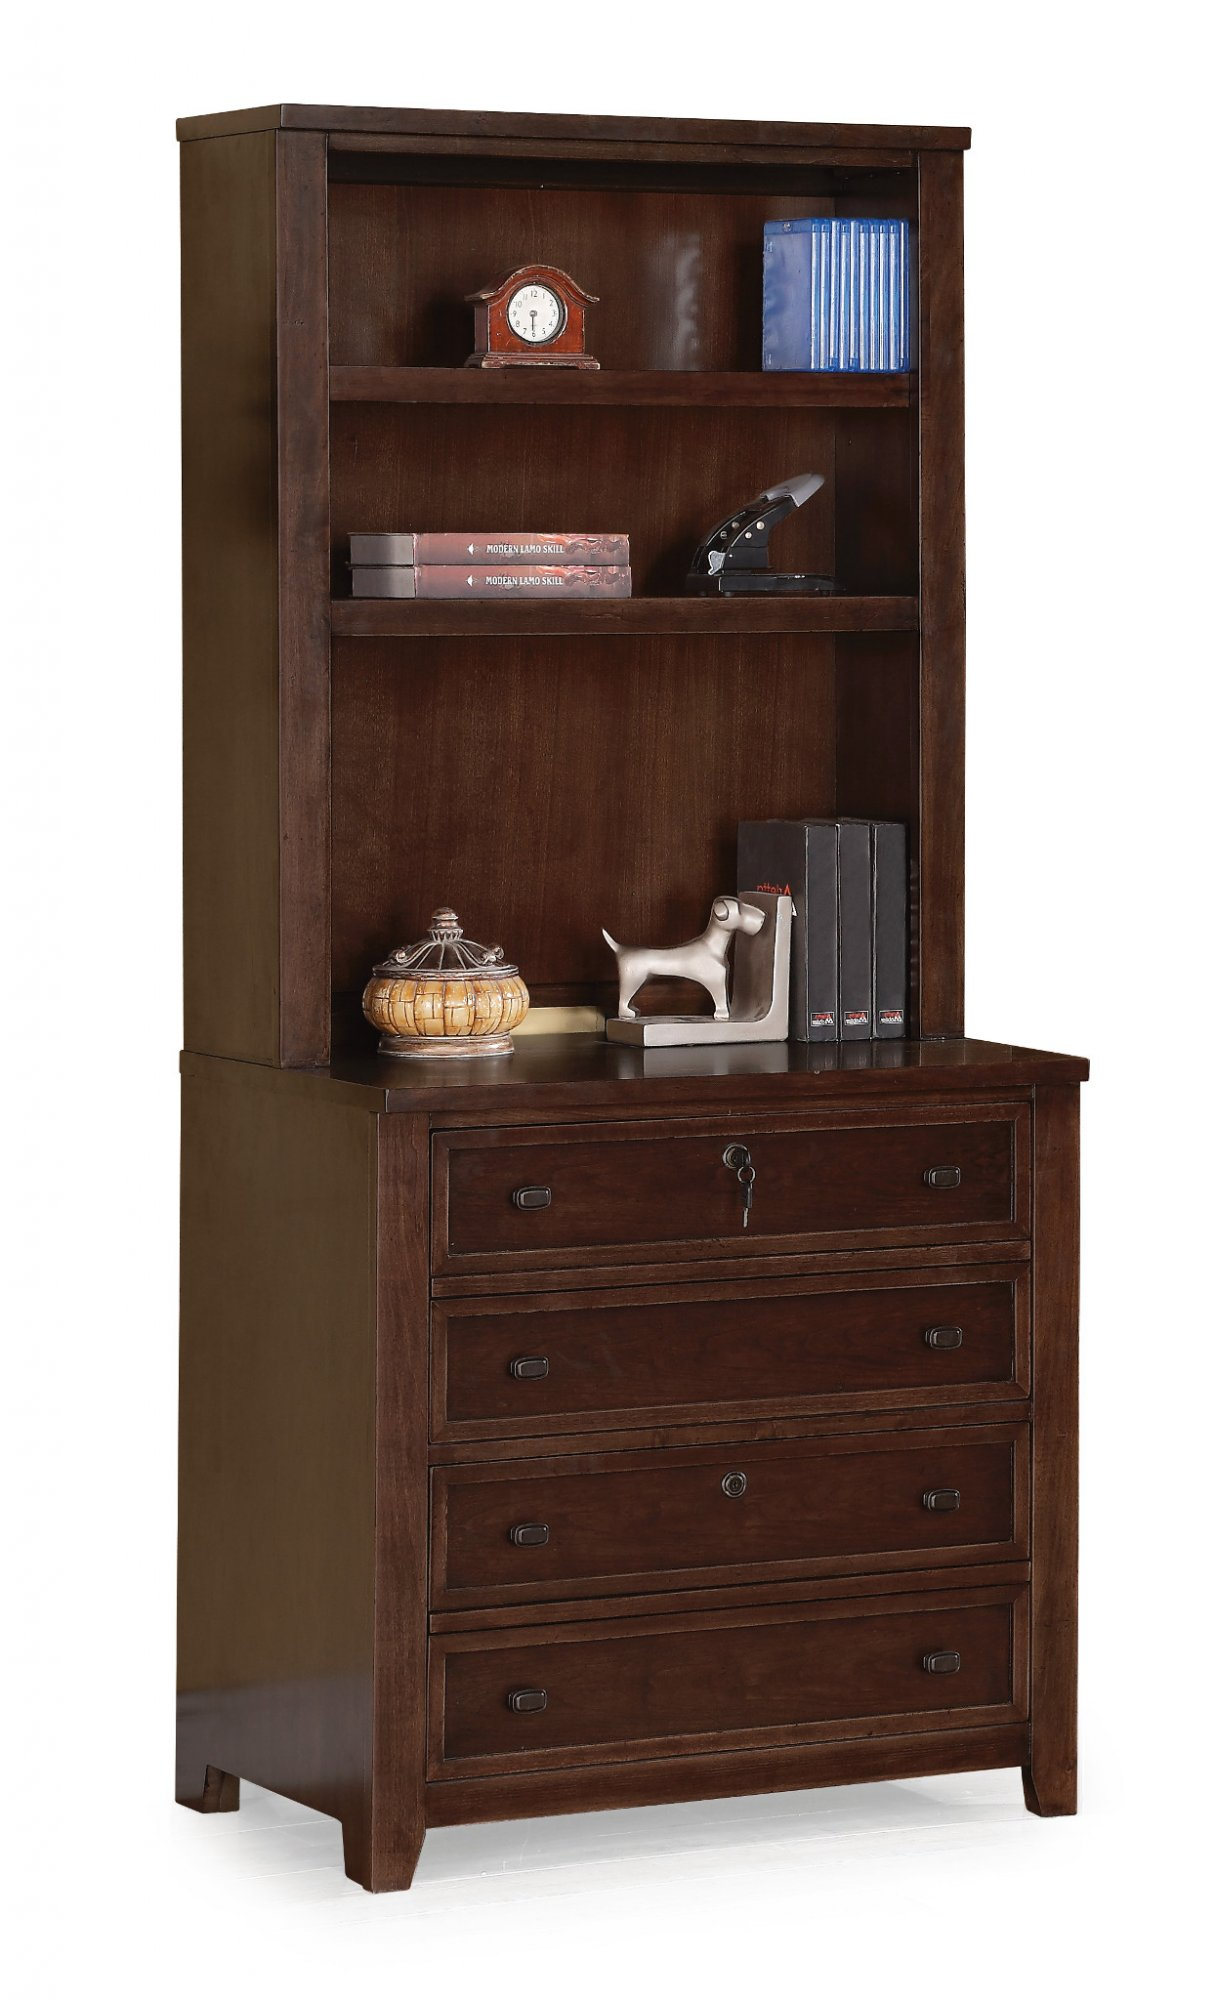 Flexsteel W1287 746 Theodore Bookcase Hutch Reese